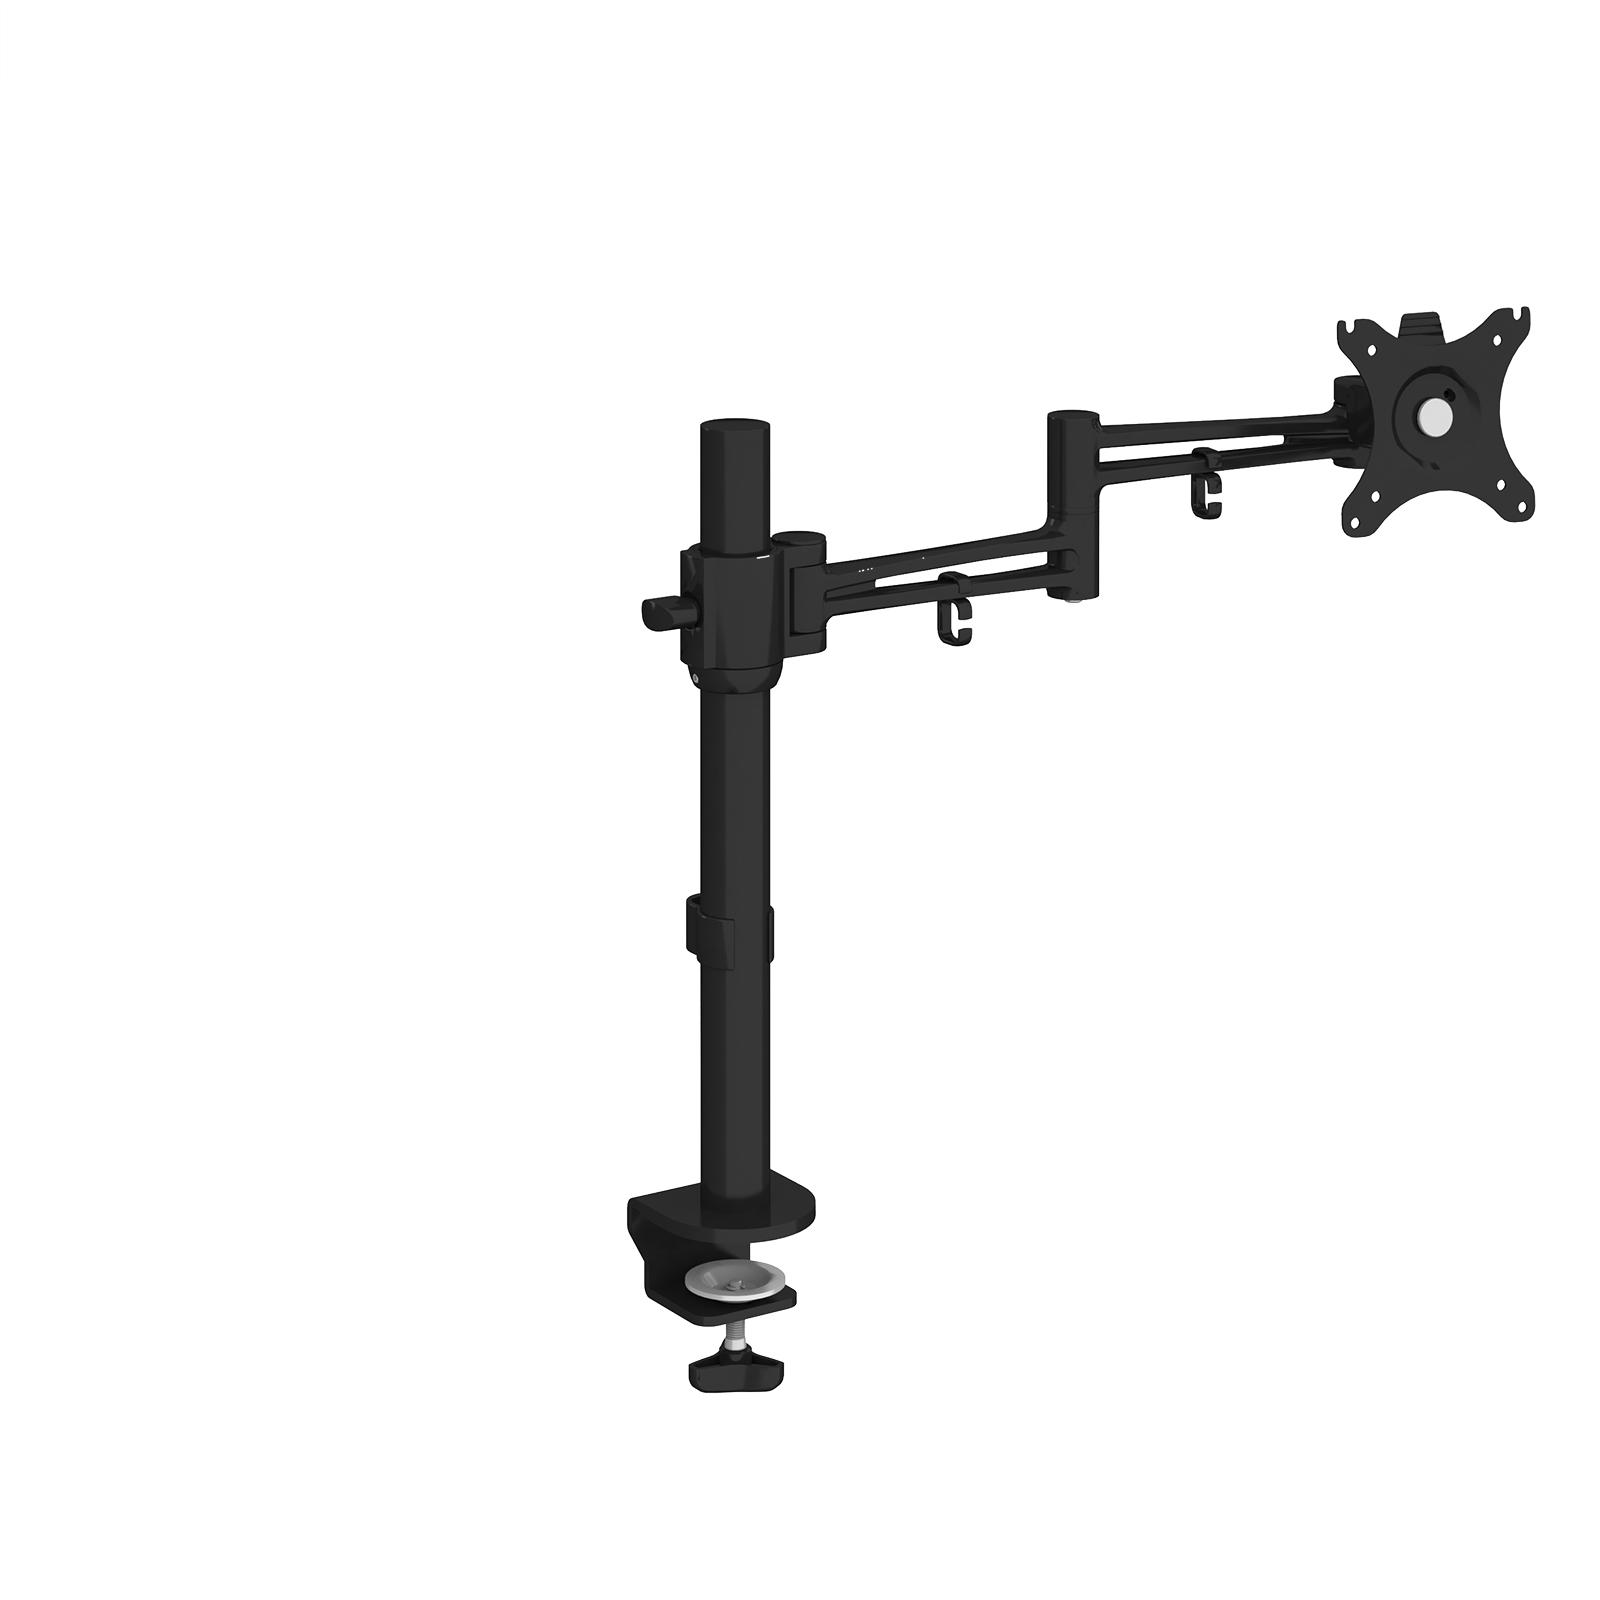 Arms Luna single flat screen monitor arm - black